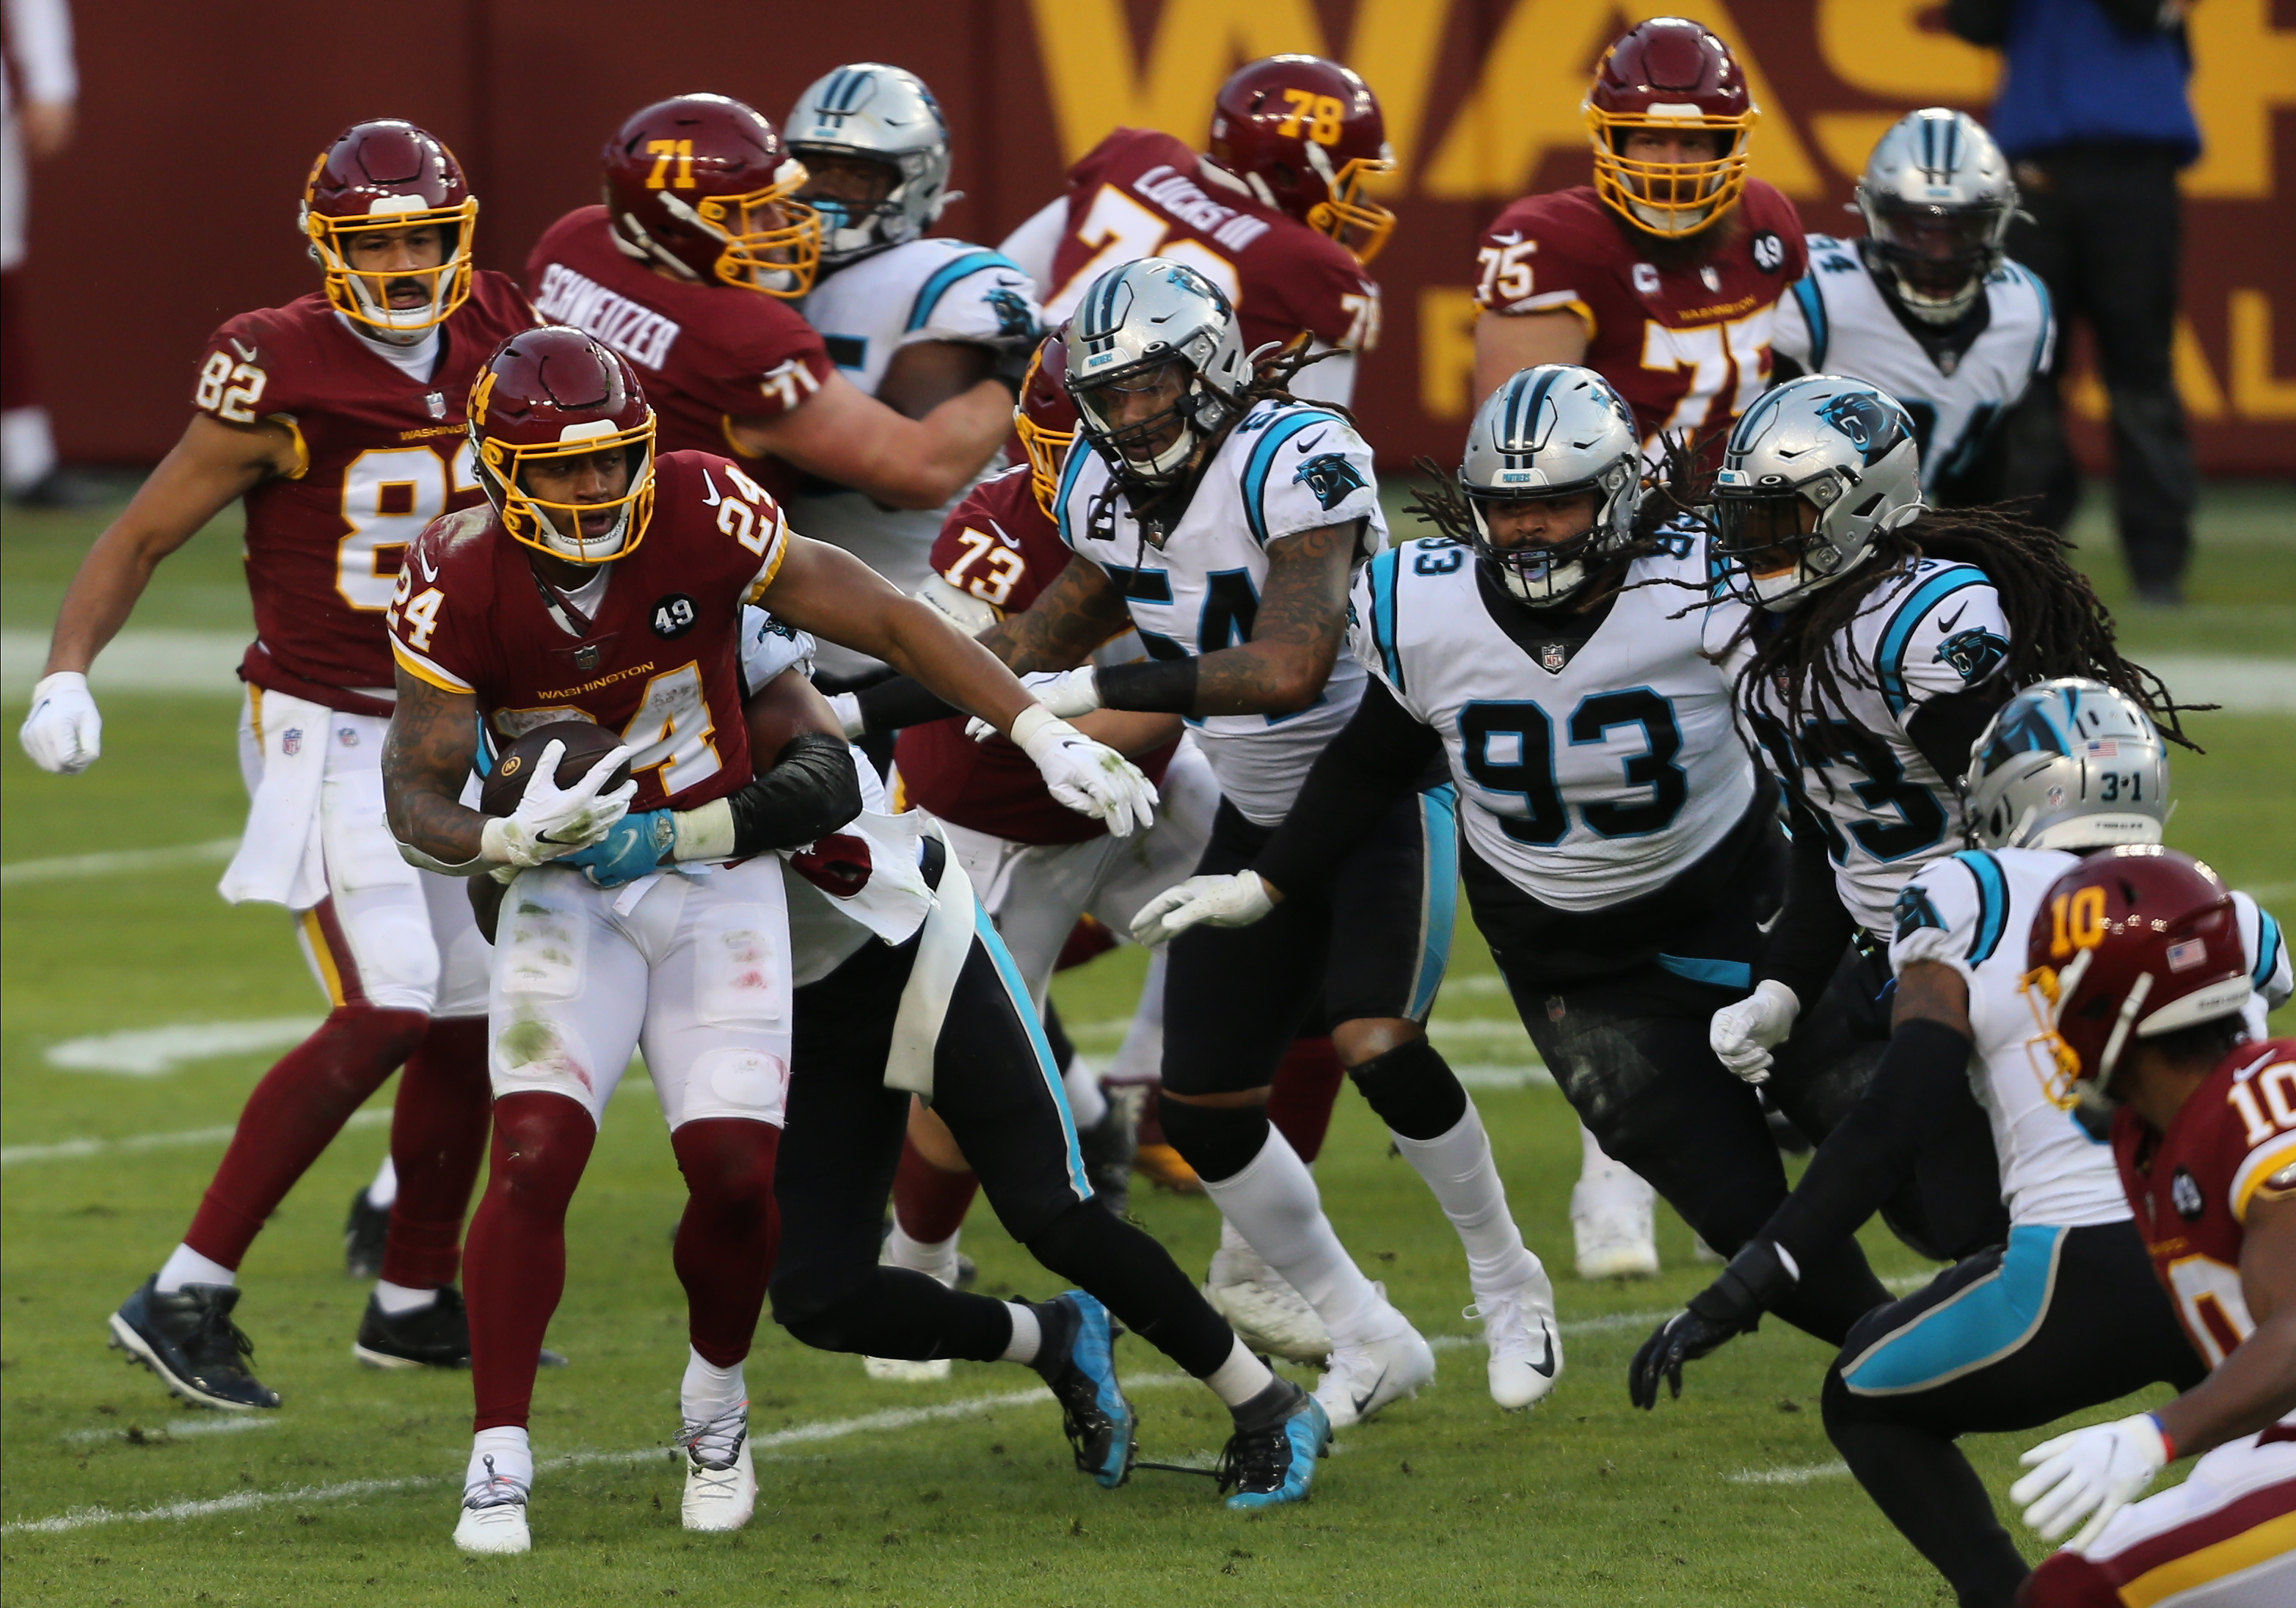 NFL: DEC 27 Panthers at Washington Football Team